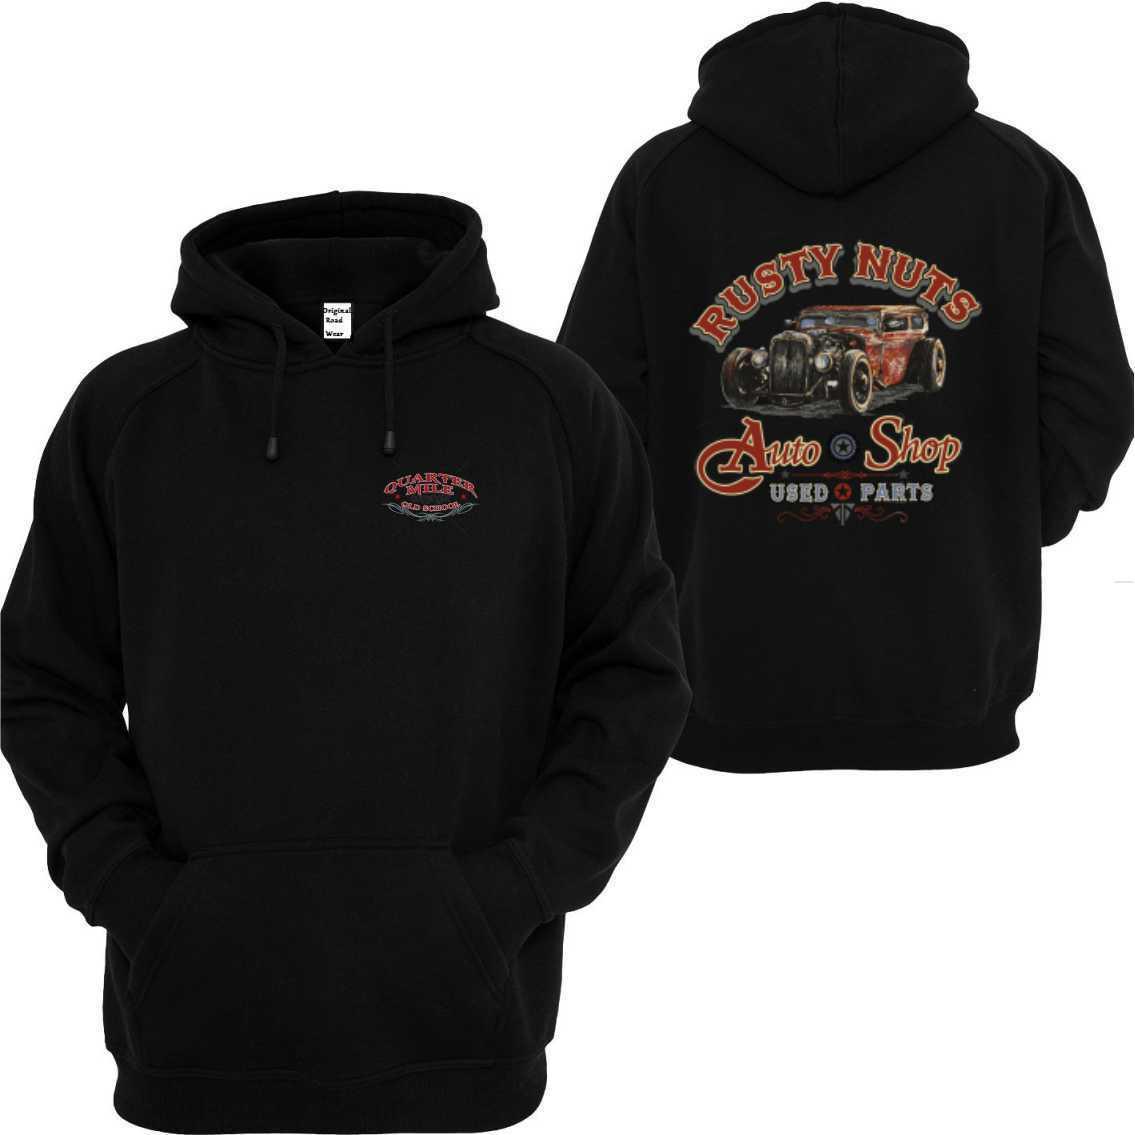 Kapuzensweatshirt black V8 Oldschool Hot Rod US Car `50 Stylemotiv Rusty Nuts